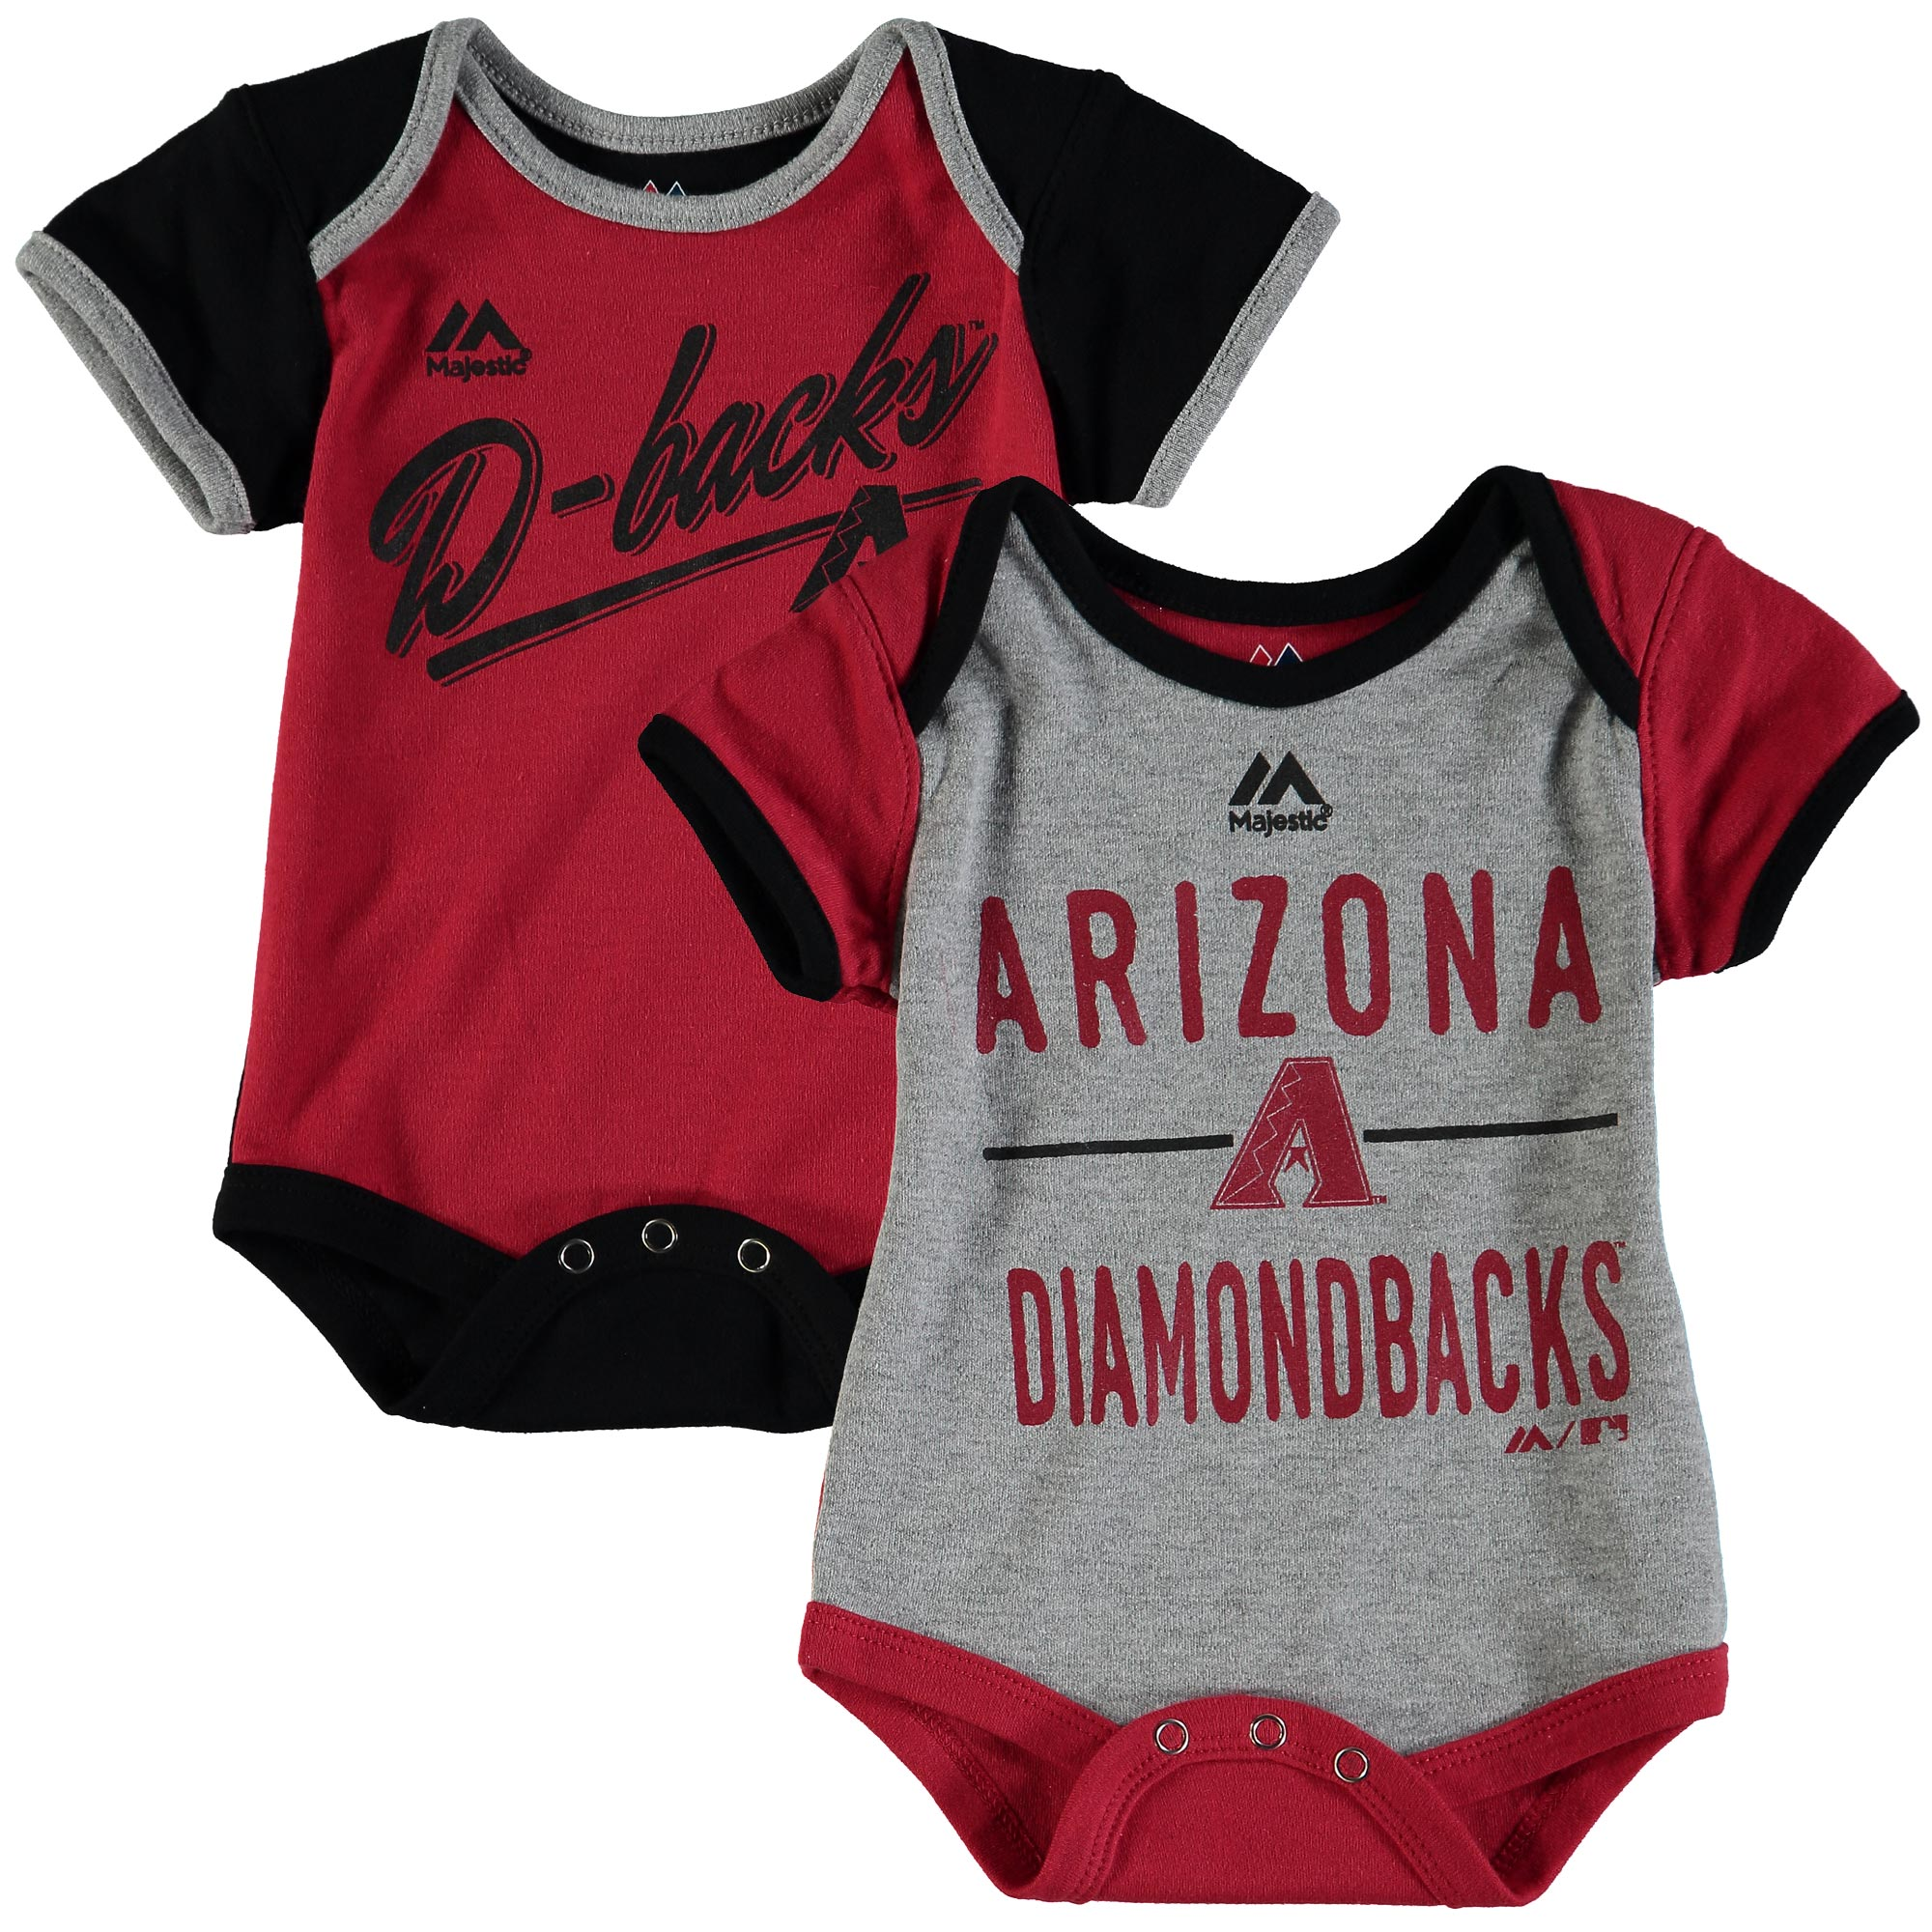 Arizona Diamondbacks Majestic Newborn & Infant 2-Piece Bodysuit Set - Red/Black